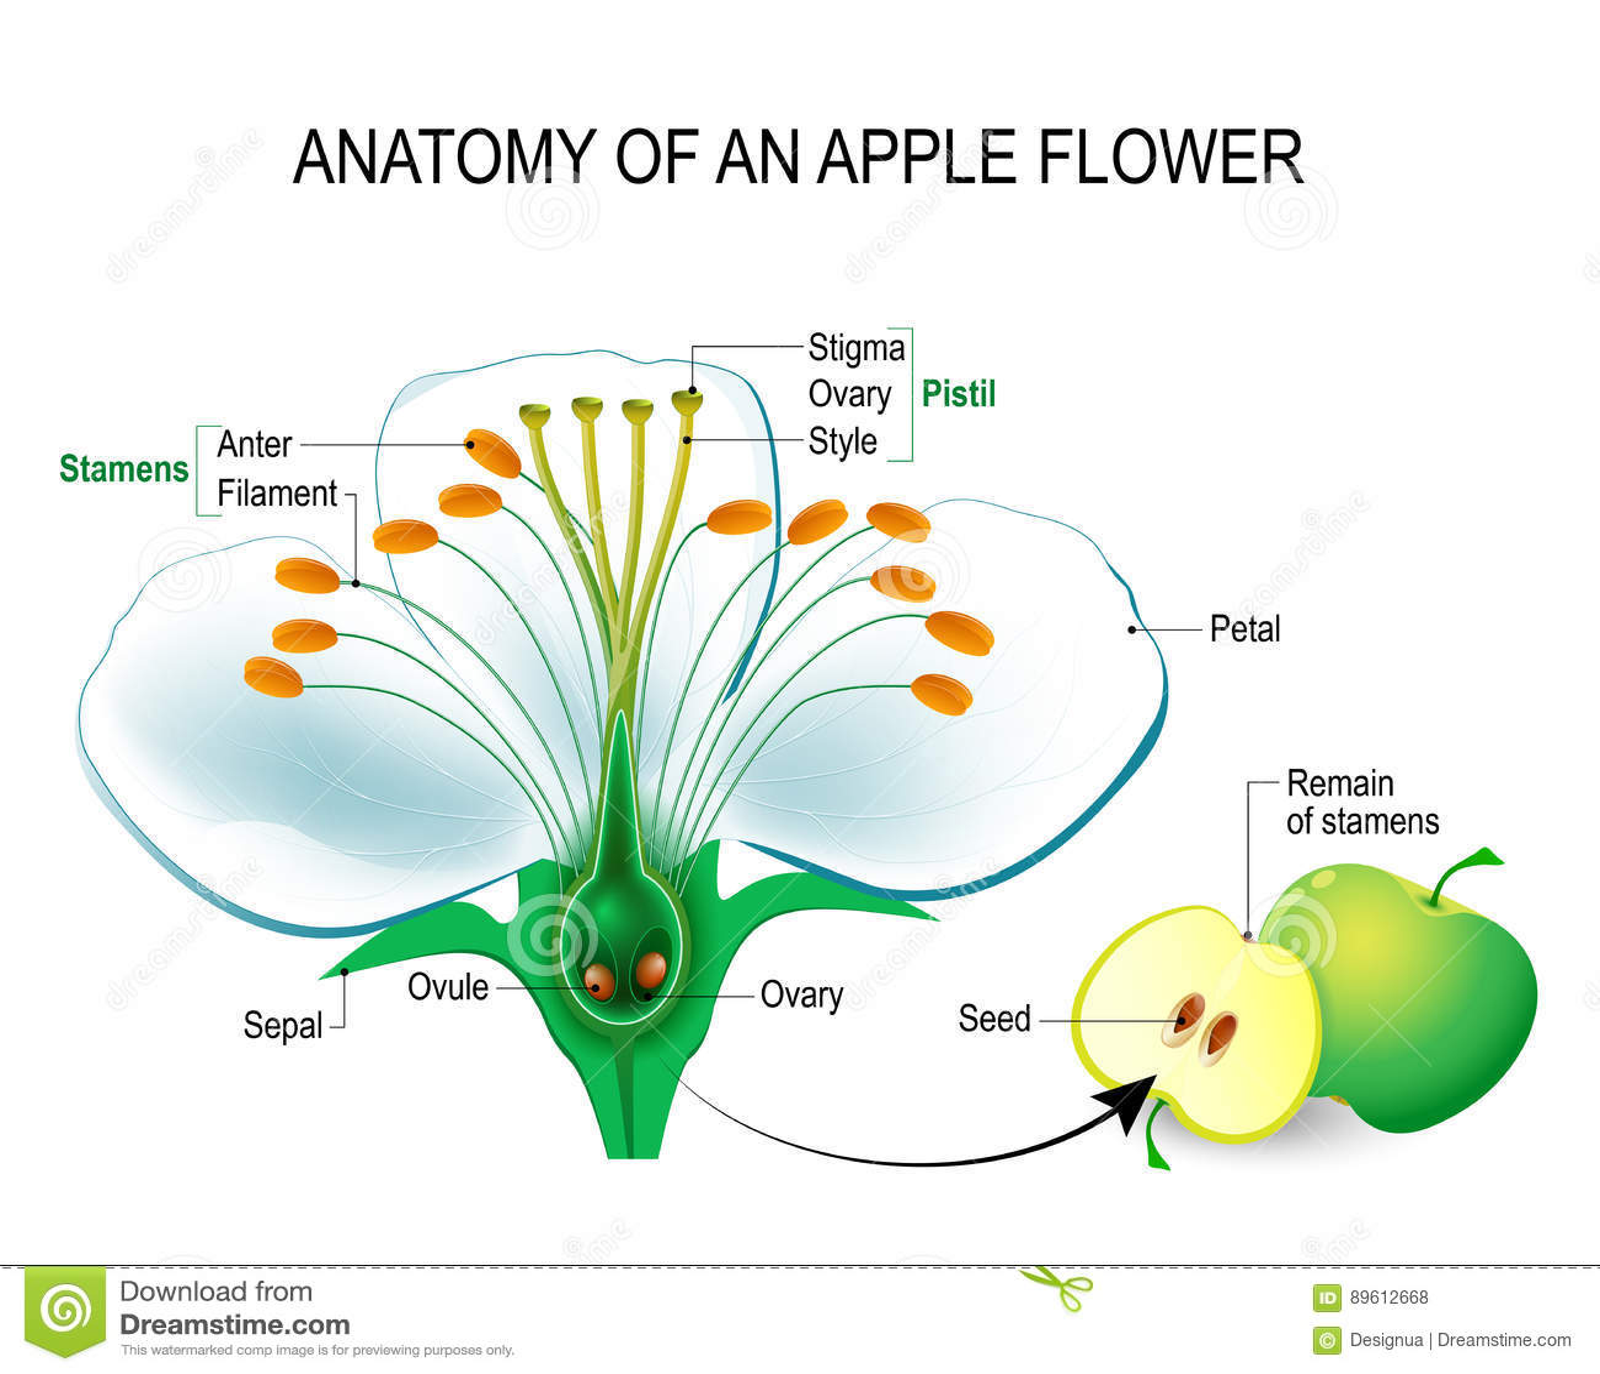 Worksheet Seed Parts Of Fruit